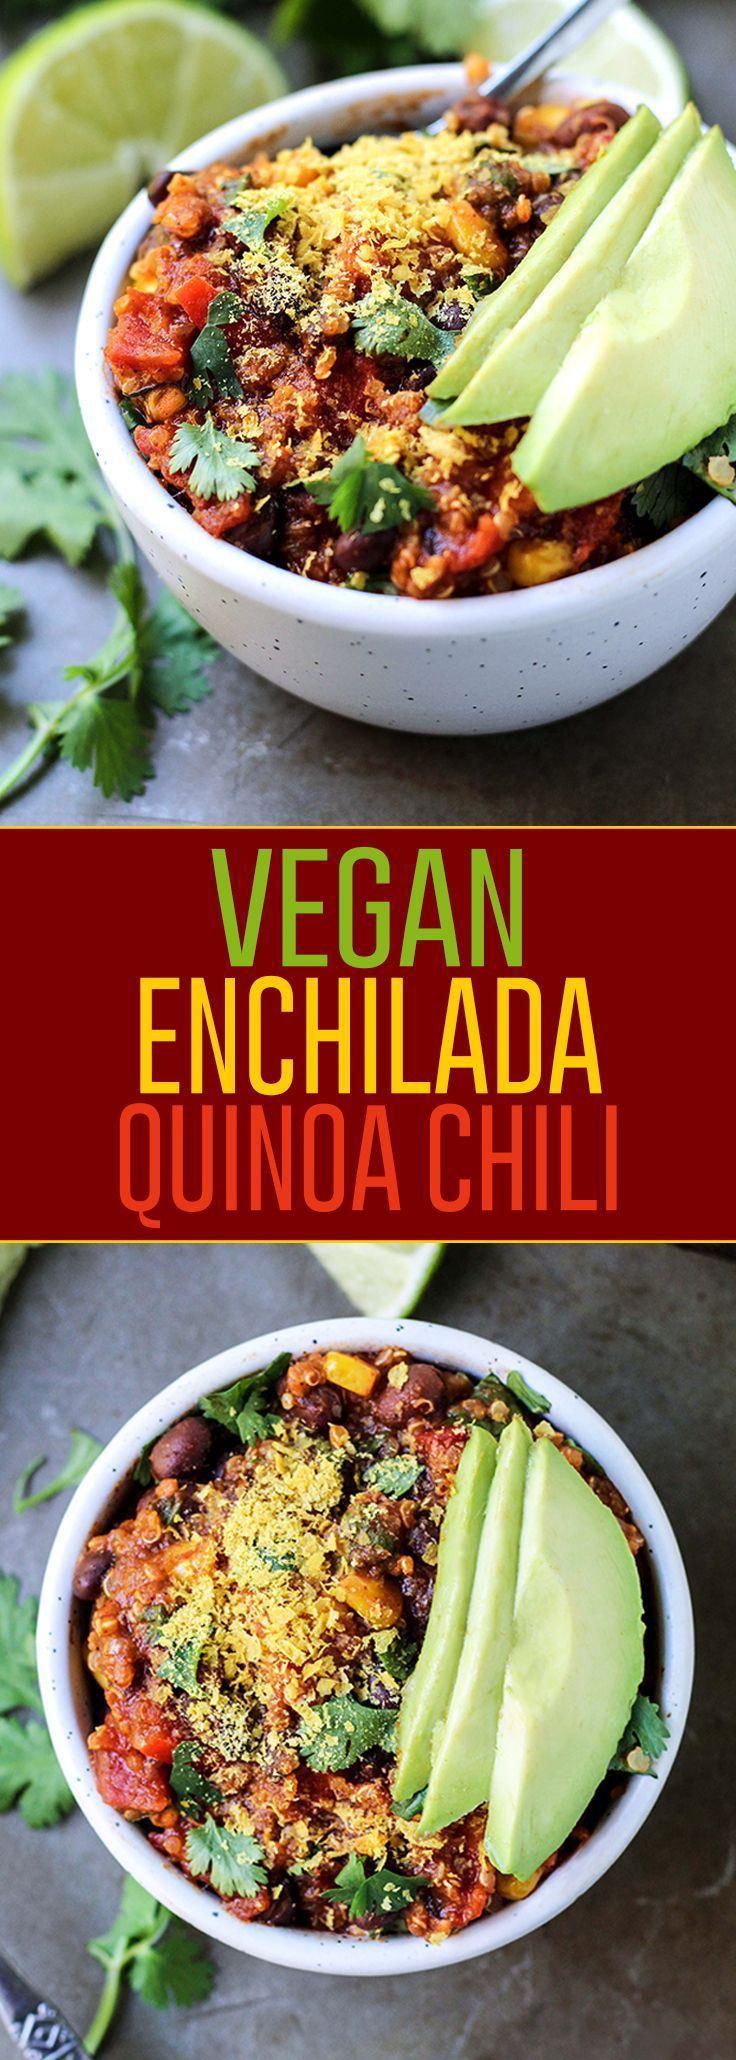 Slow Cooker Vegan Enchilada Quinoa Chili